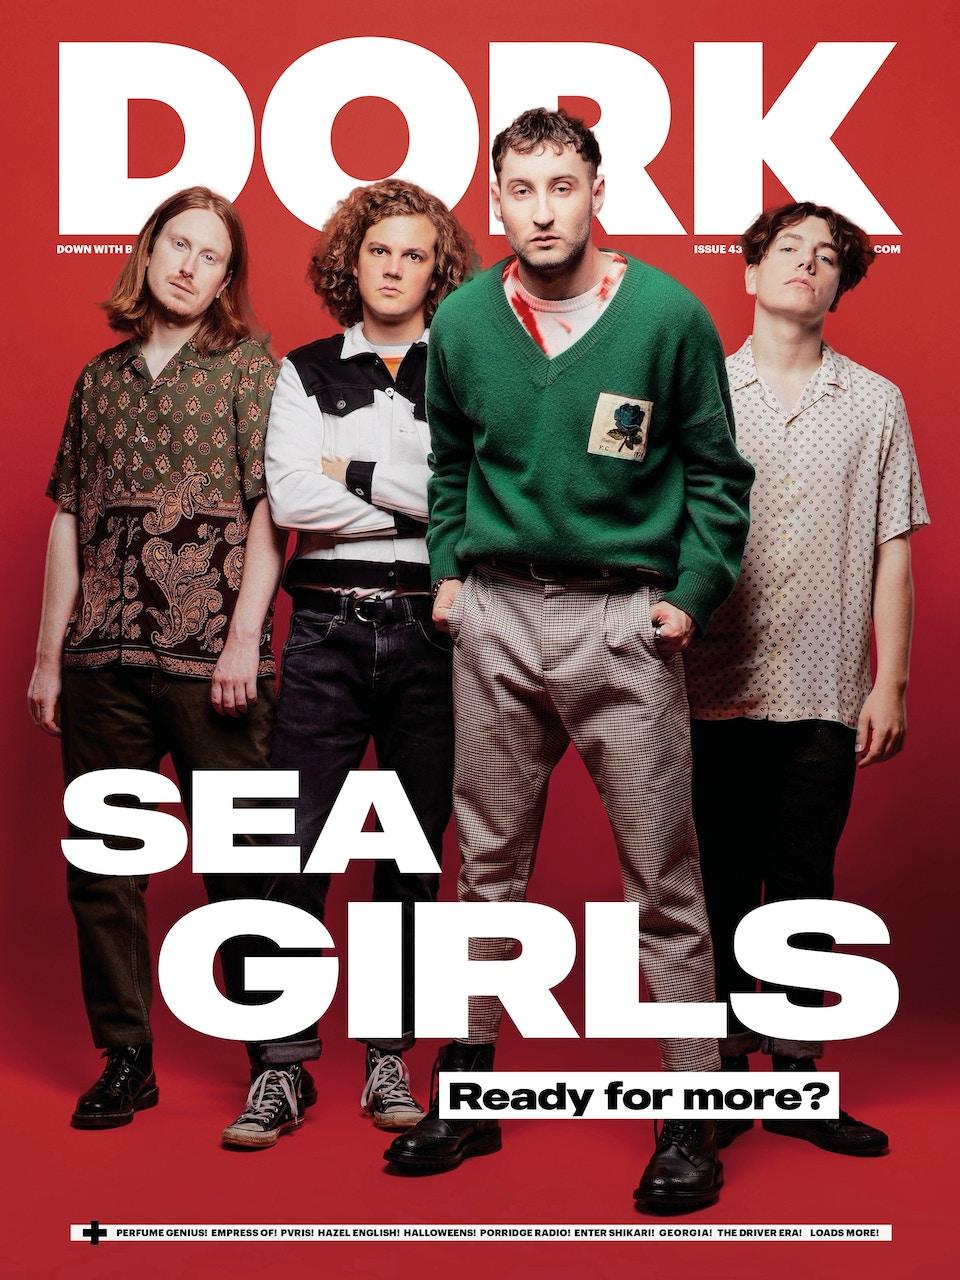 SEA GIRLS X DORK MAG